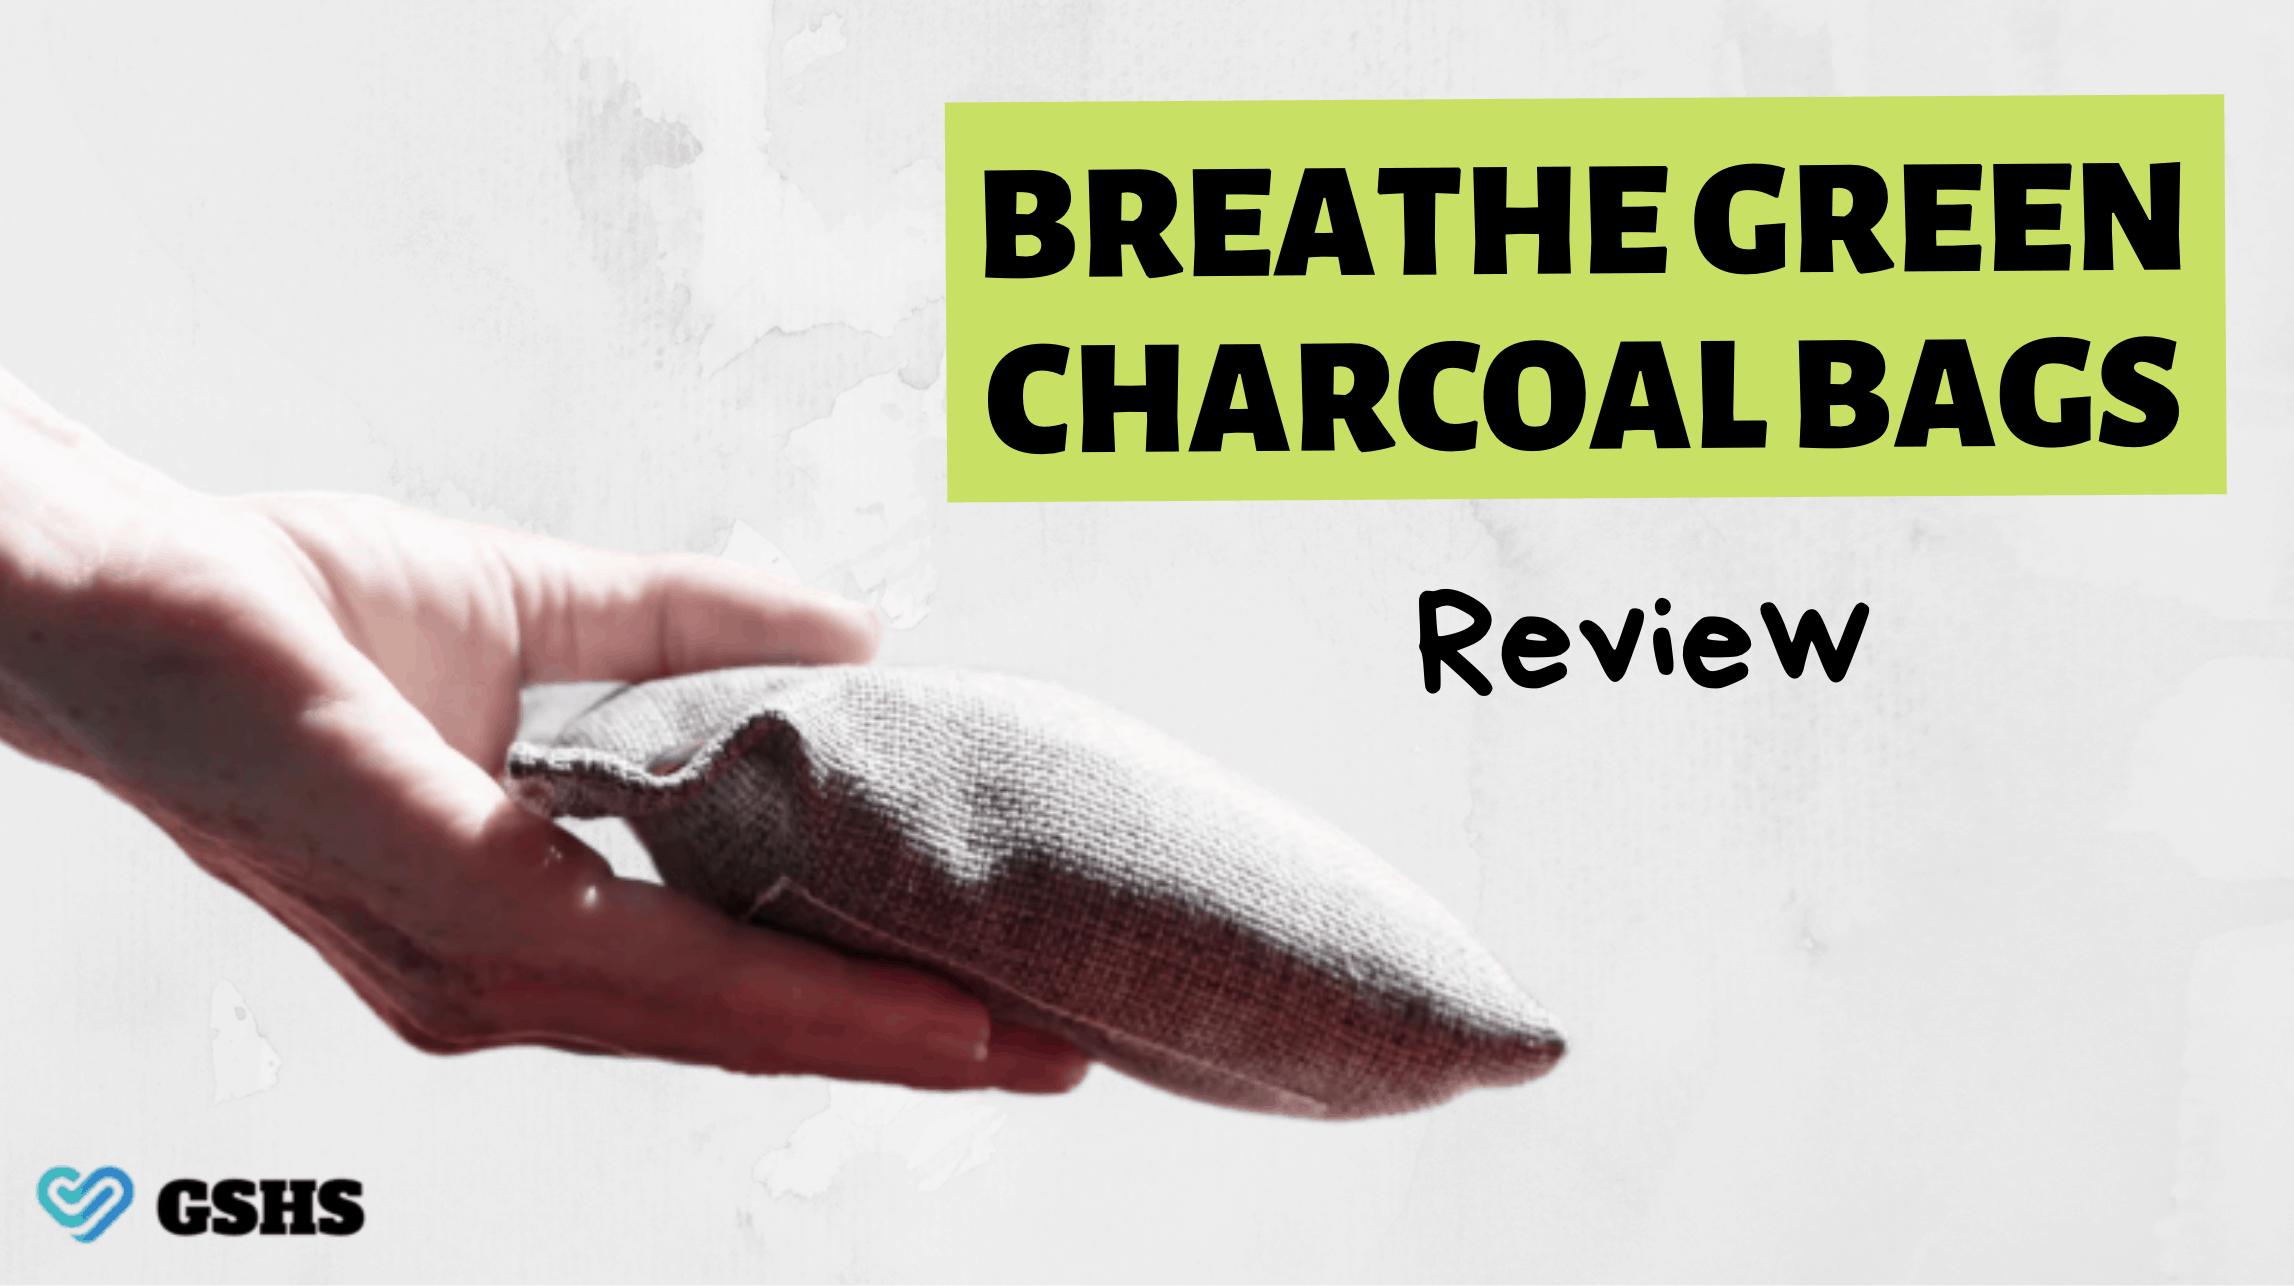 Breathe Clean Charcoal Bags - in Hersteller-Website - kaufen - in apotheke - bei dm - in deutschland